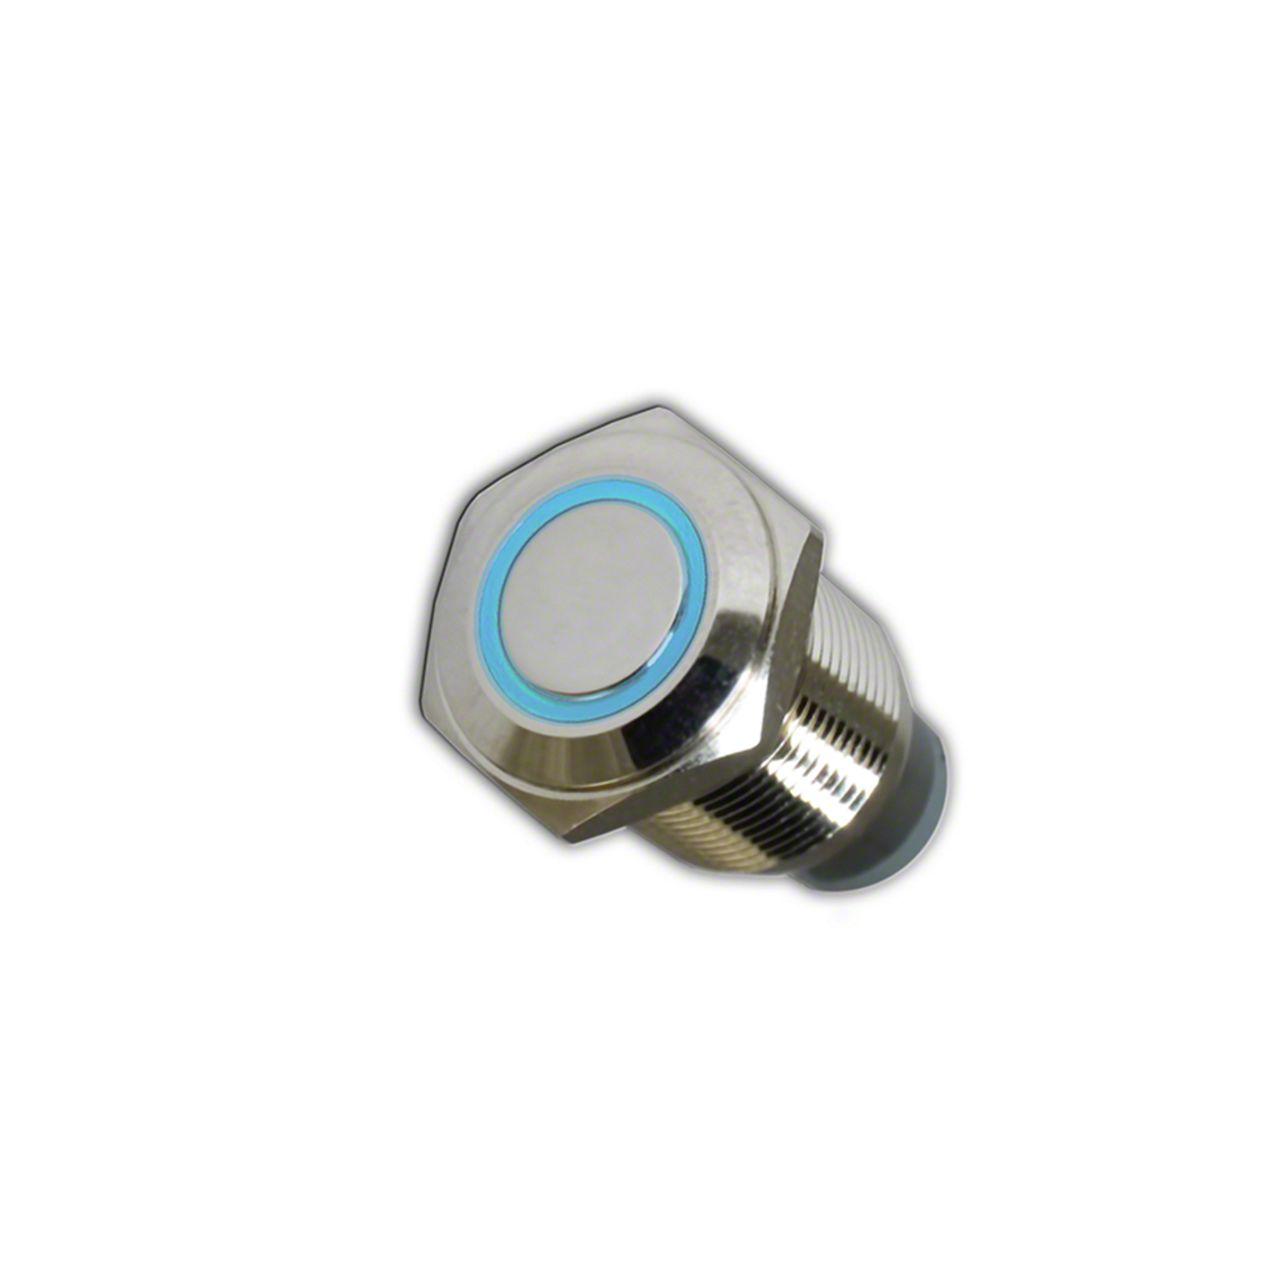 Oracle On/Off Flush Mount LED Switch - Blue (07-18 Sierra 1500)